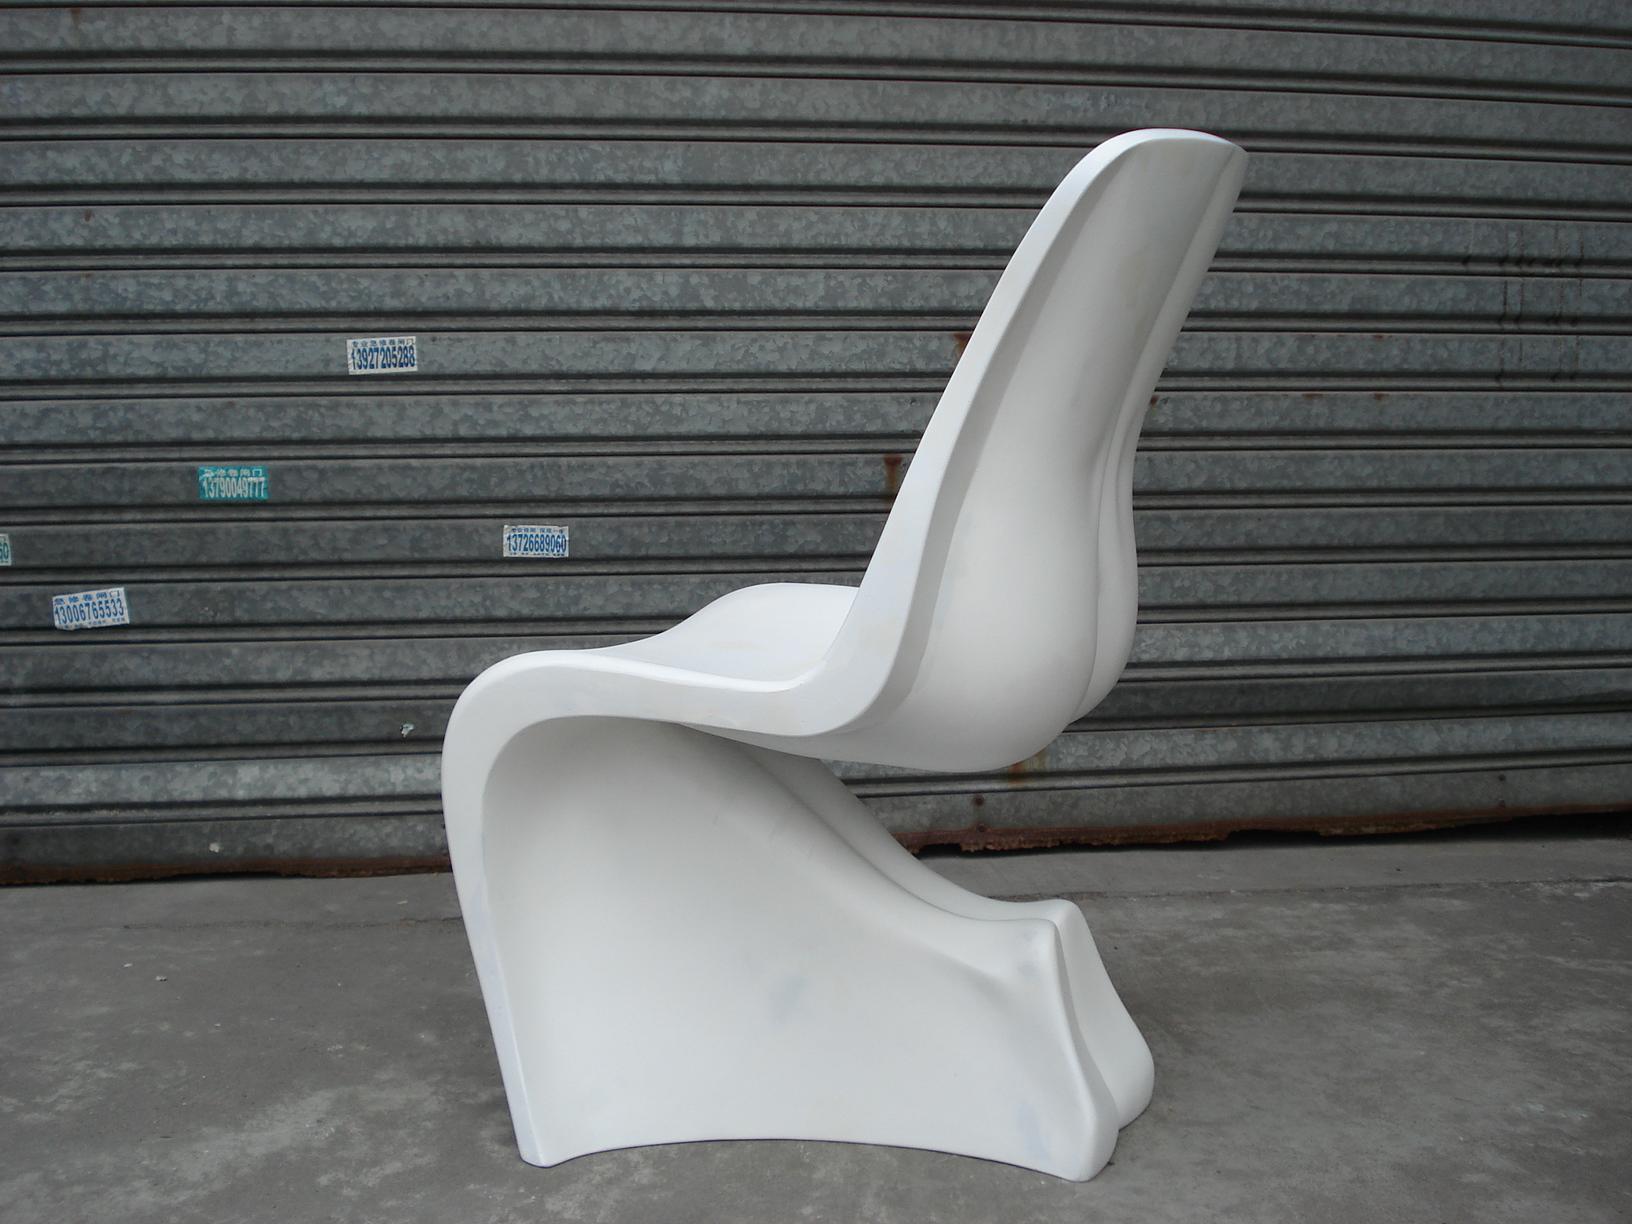 Replica Fiberglass S Shaped Fabio Novembre Him & Her Chair 8